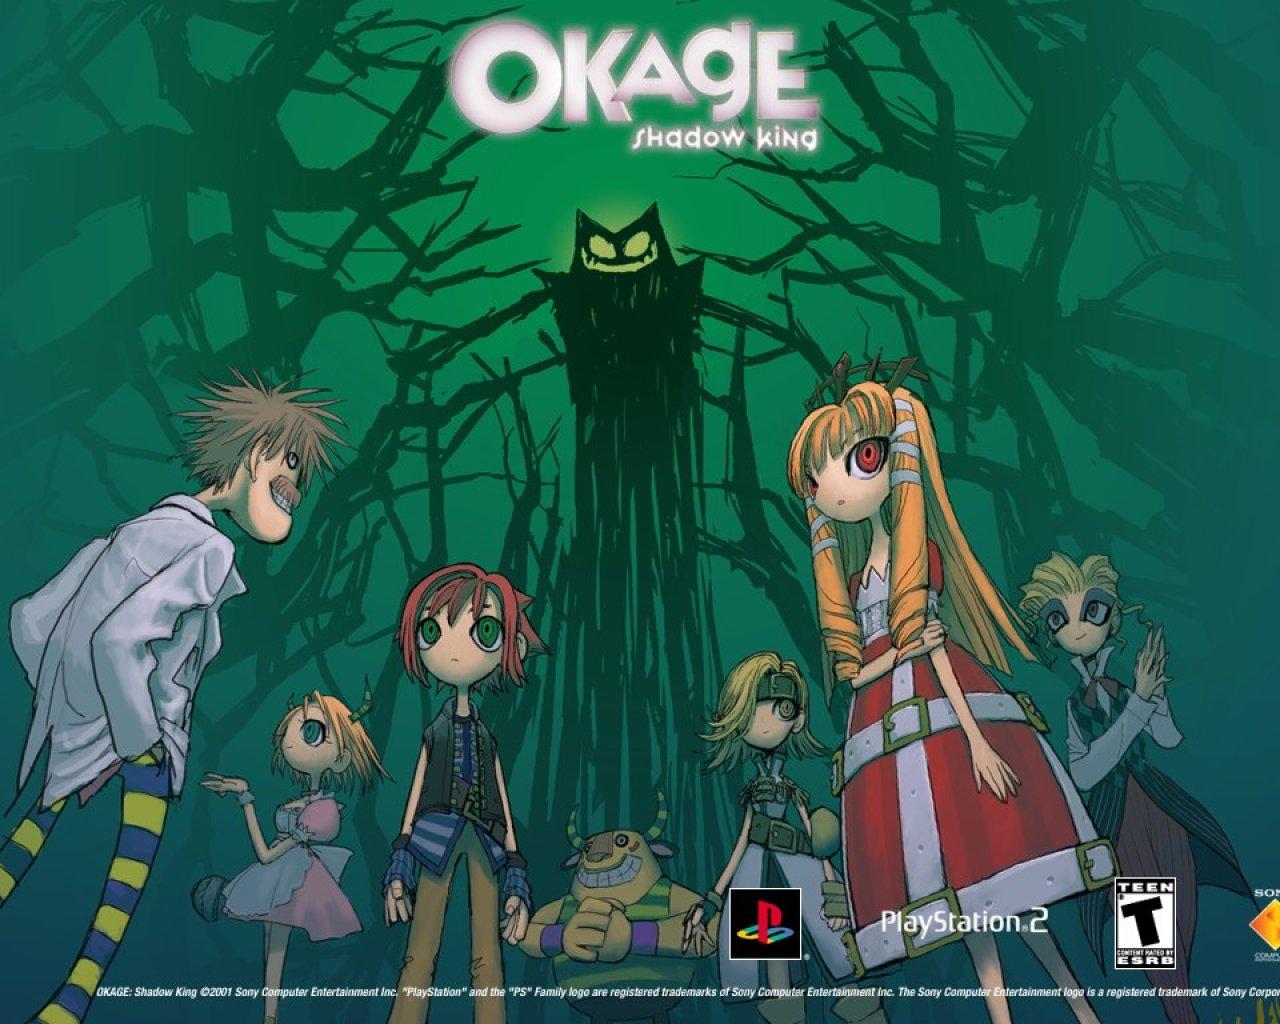 New 3d Animation Wallpaper Okage Shadow King Wallpapers Download Okage Shadow King